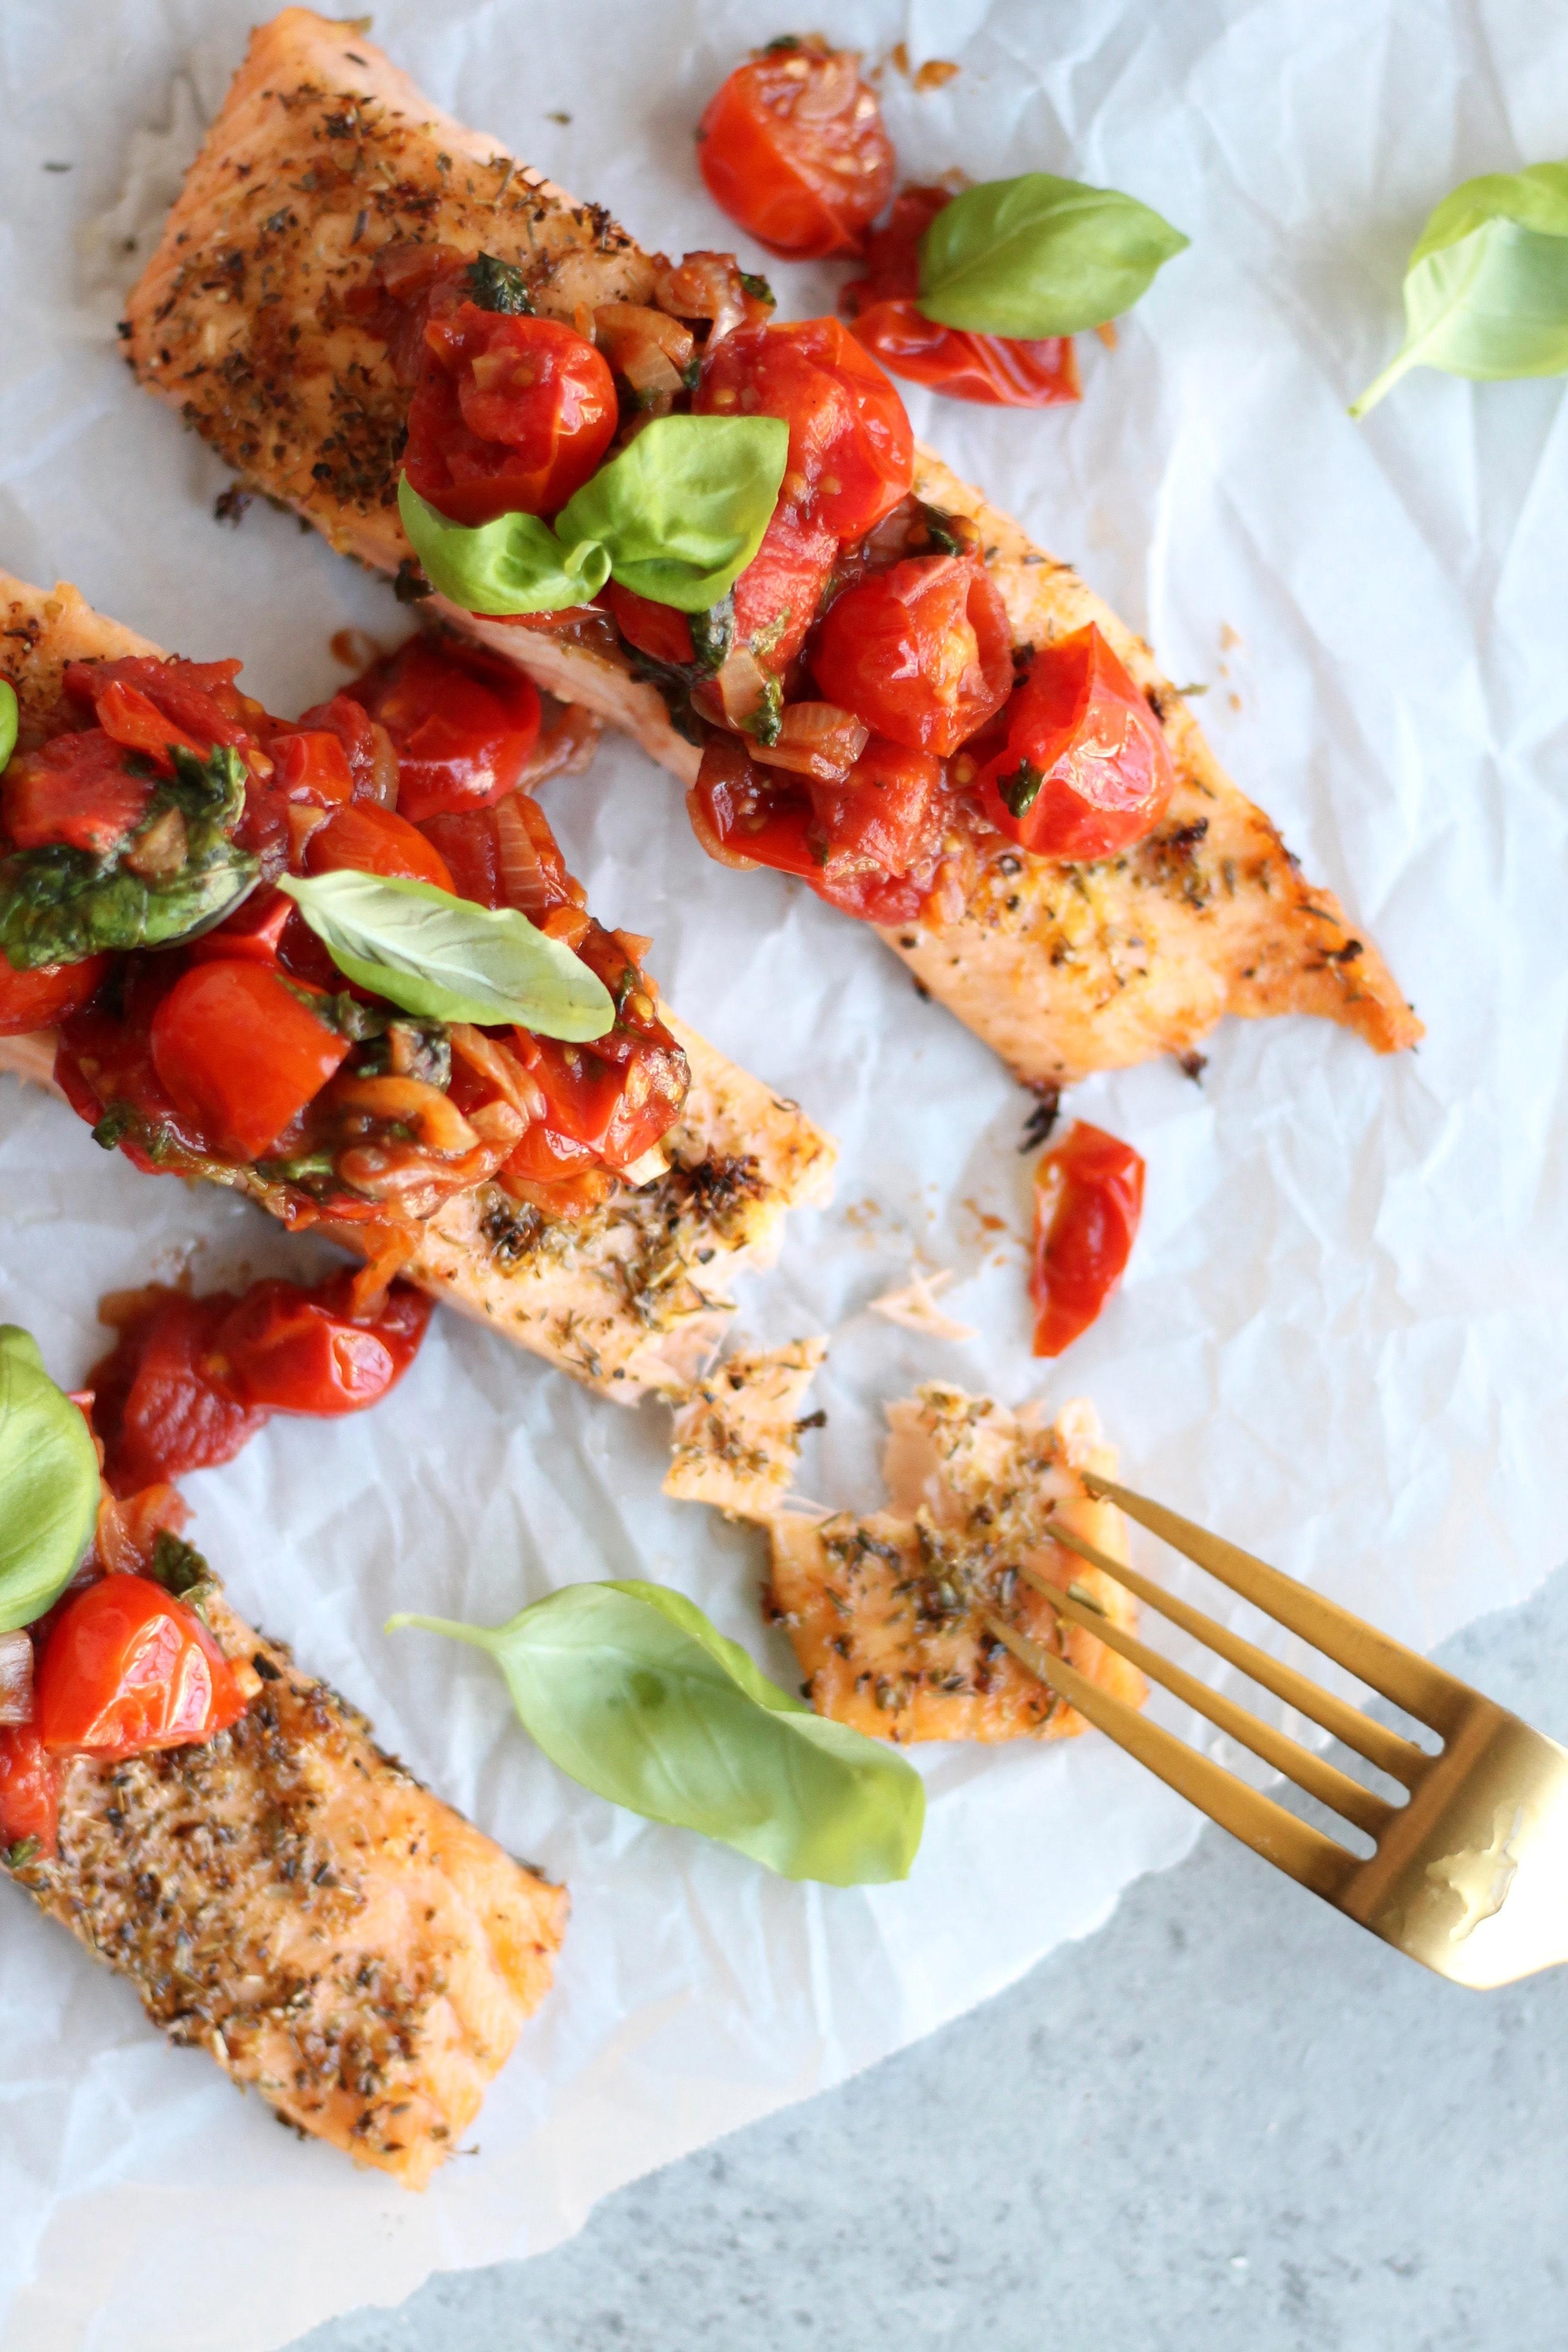 Salmon with Warm Shallot Tomato Basil Salsa